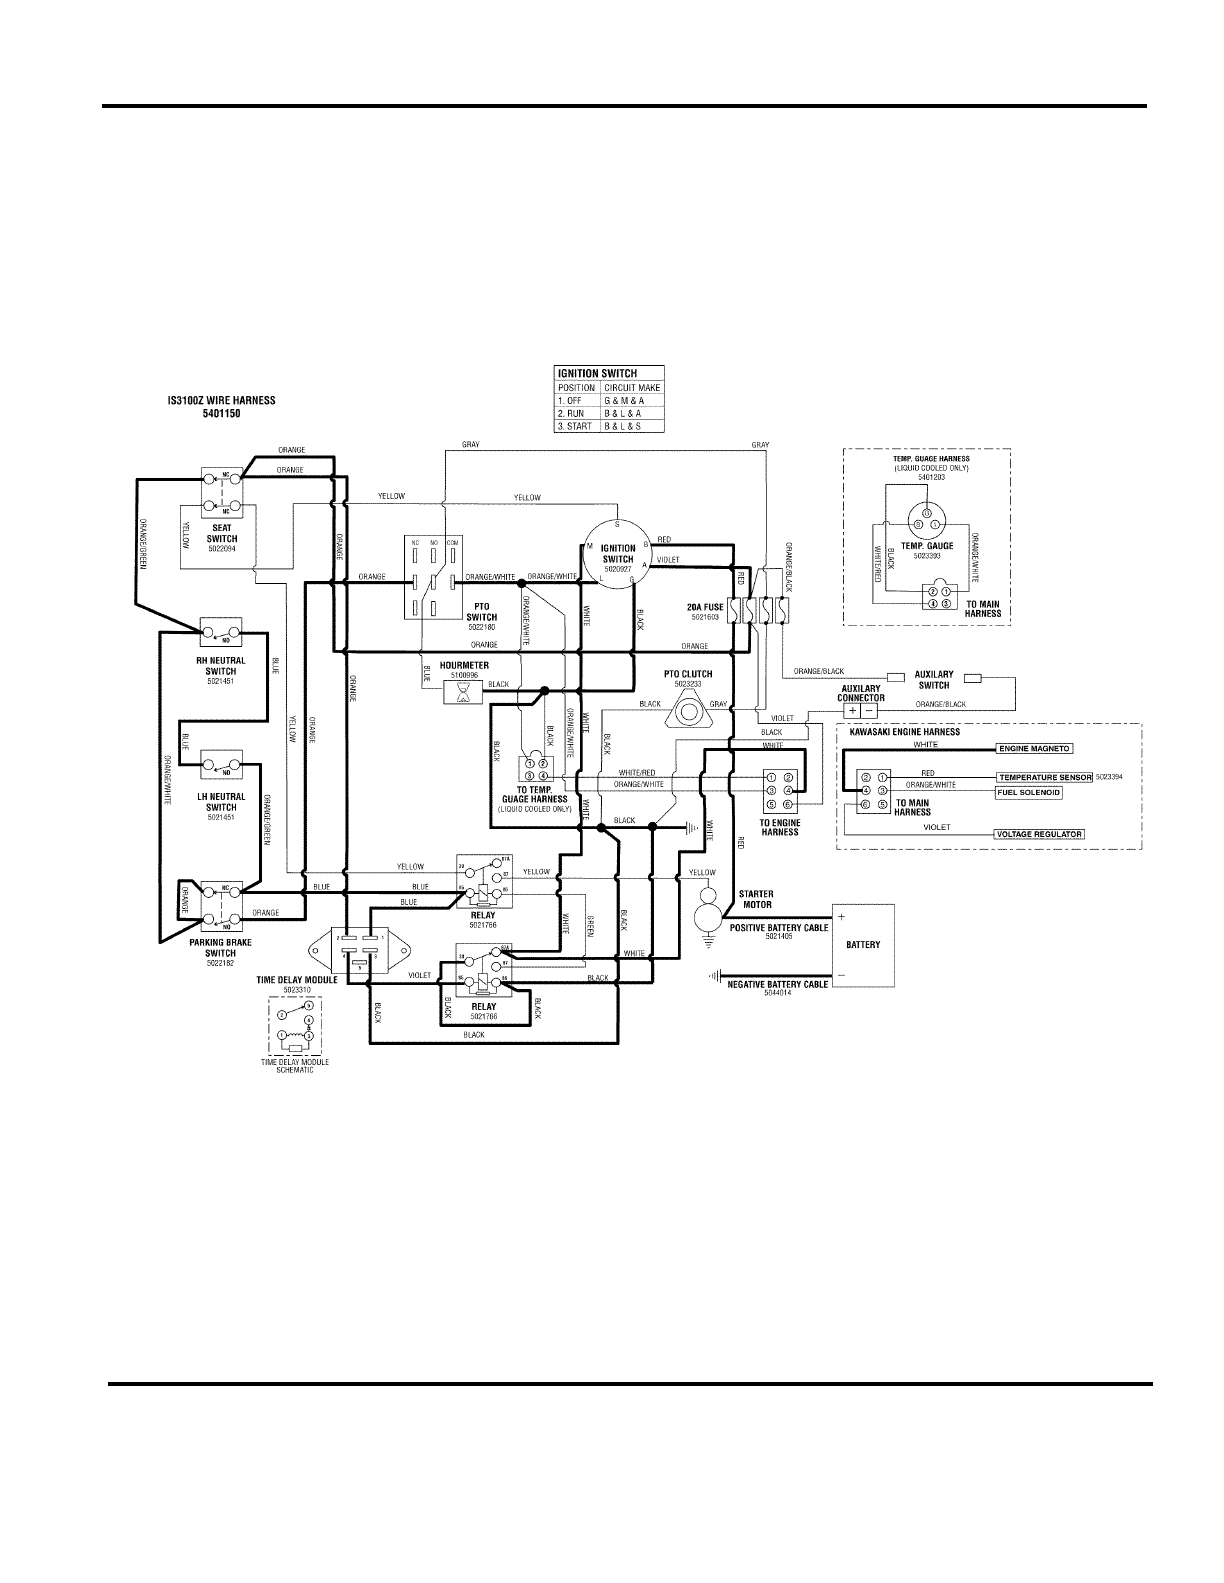 hight resolution of ferris mower wiring diagram wiring library rh 49 webseiten archiv de ferris is1500z wiring diagram ferris